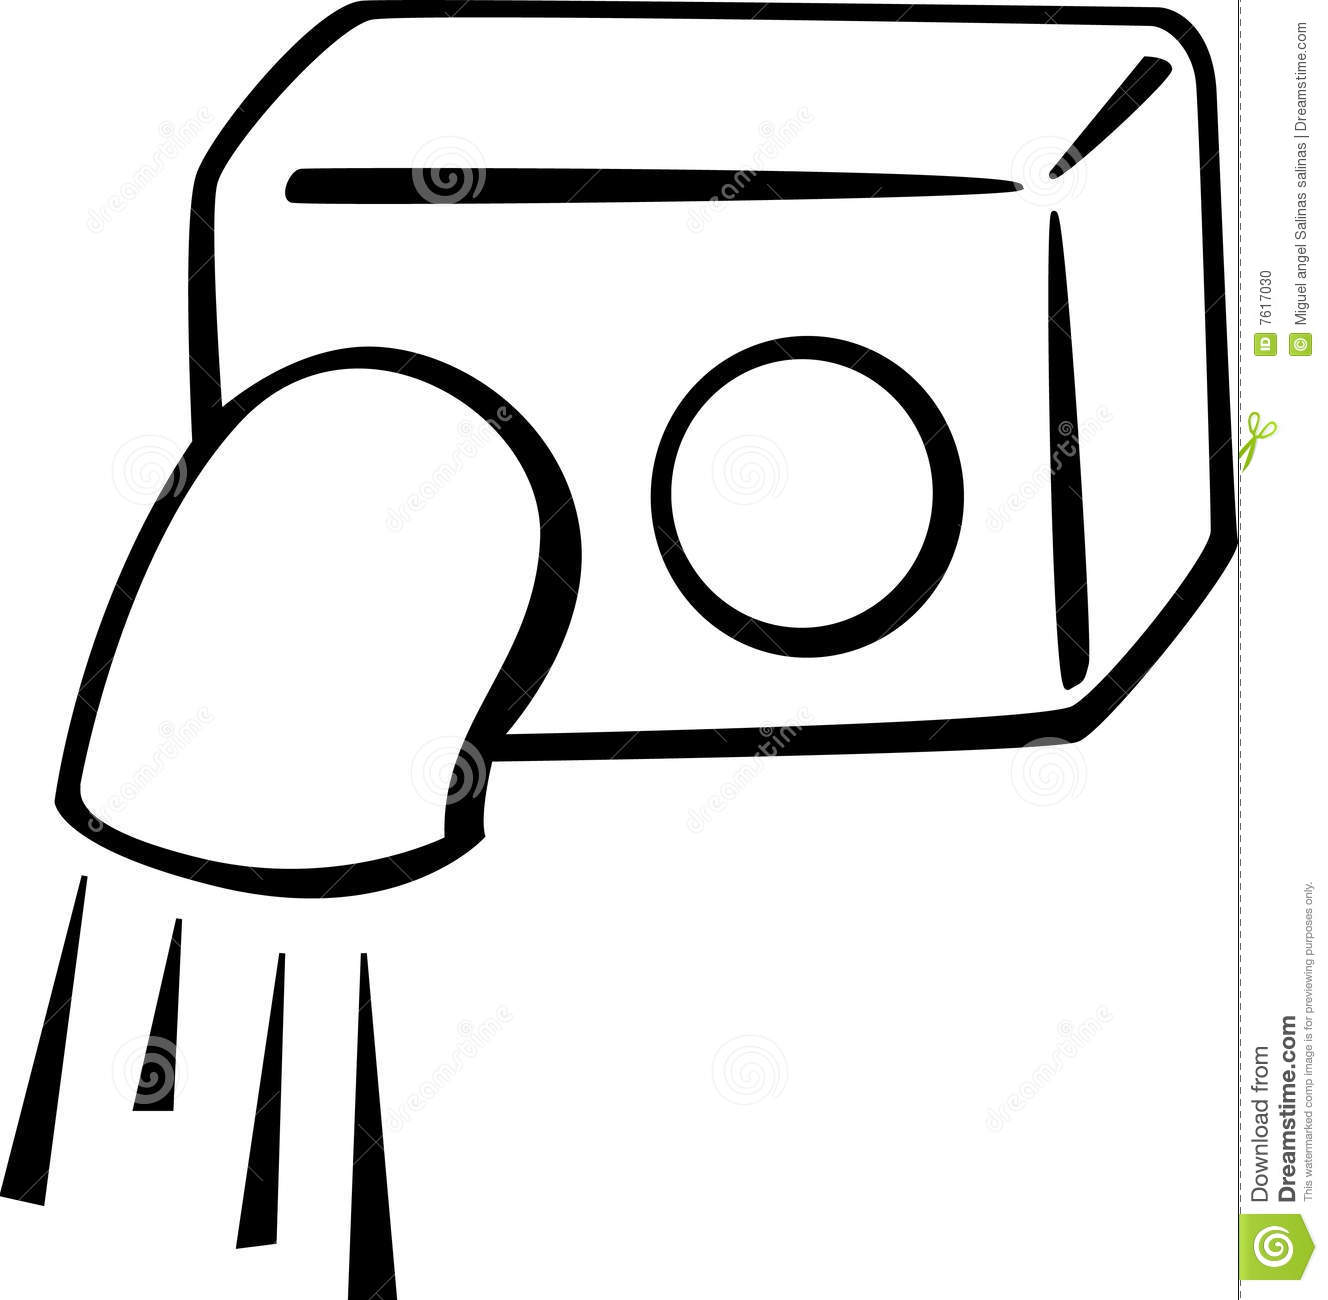 1328x1300 Dryer Bathroom Clipart, Explore Pictures